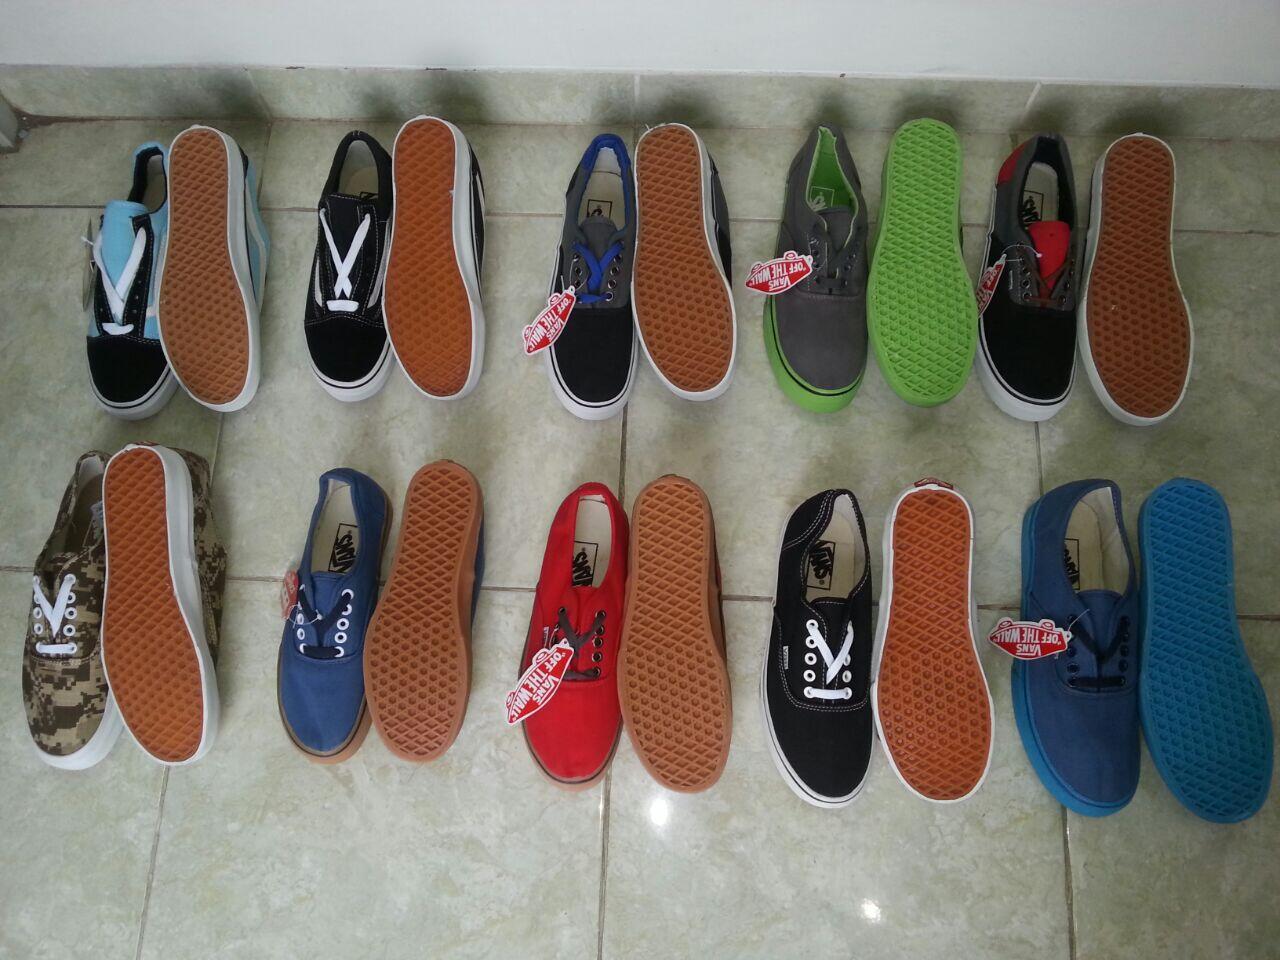 Terjual Hot Sepatu Casual Skets Vans Authentic Old School Import Waf Ifc Termurah Gan